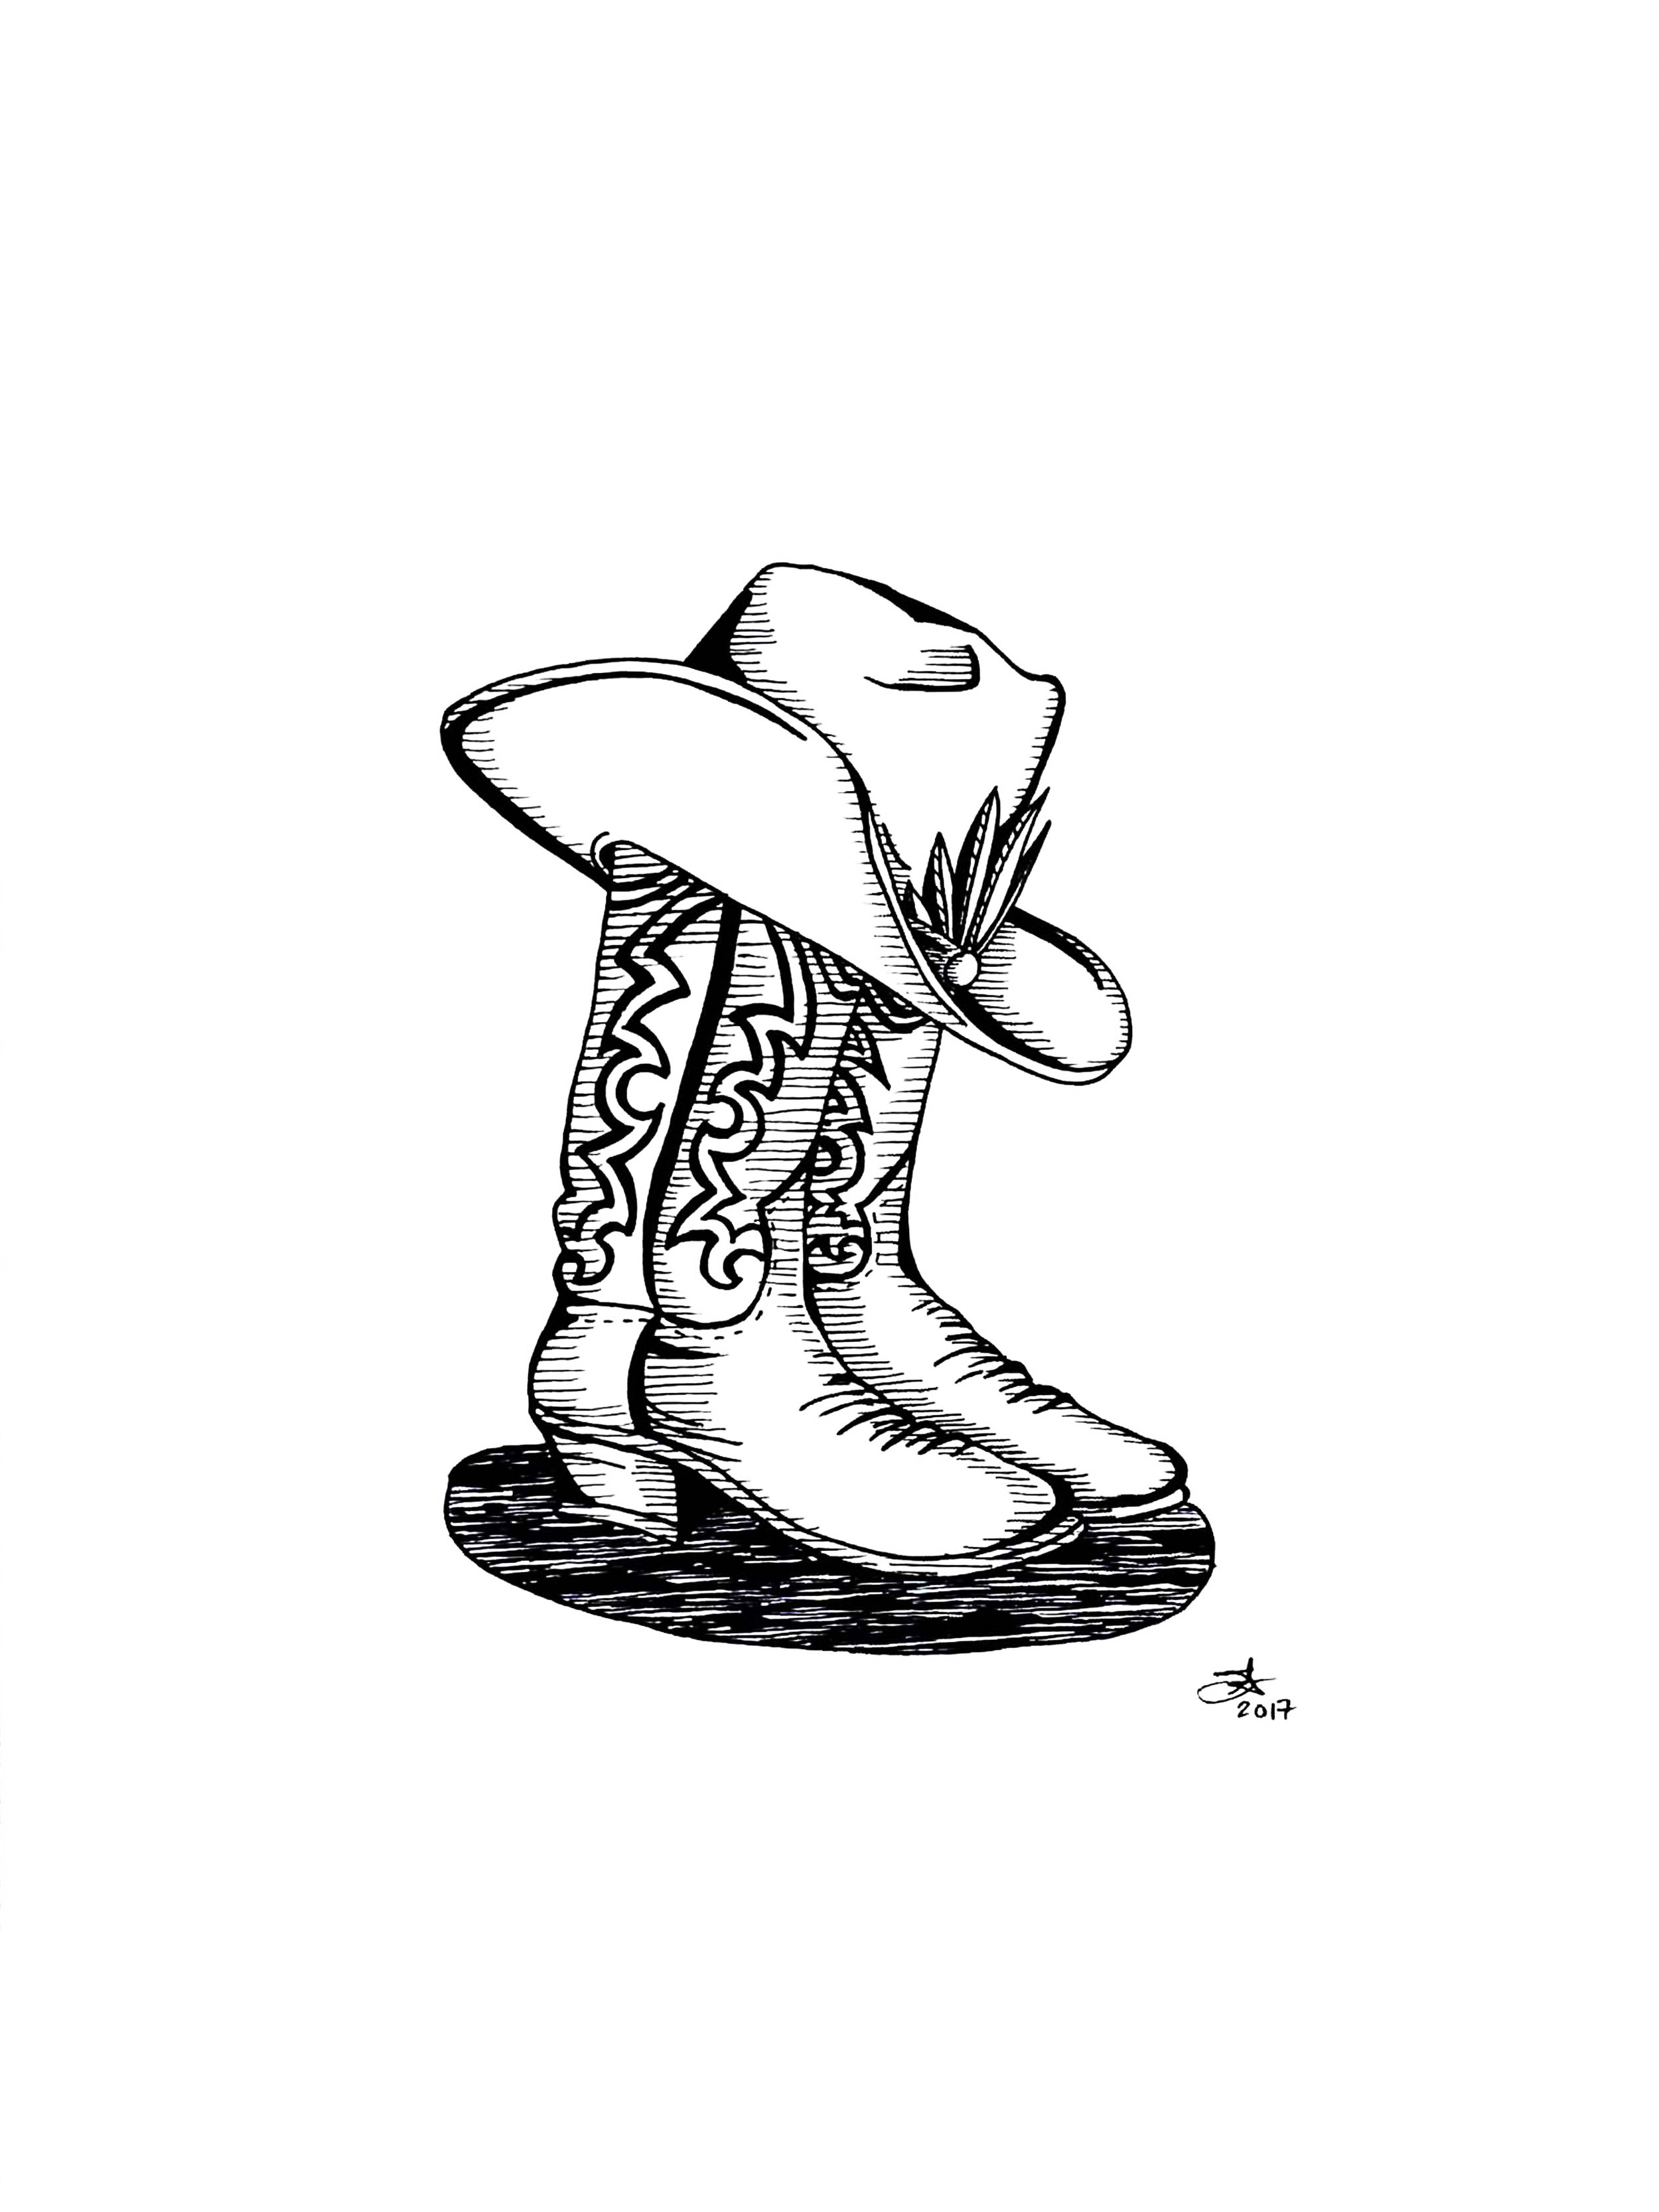 studiojeffrey_cowboy_boots_hat